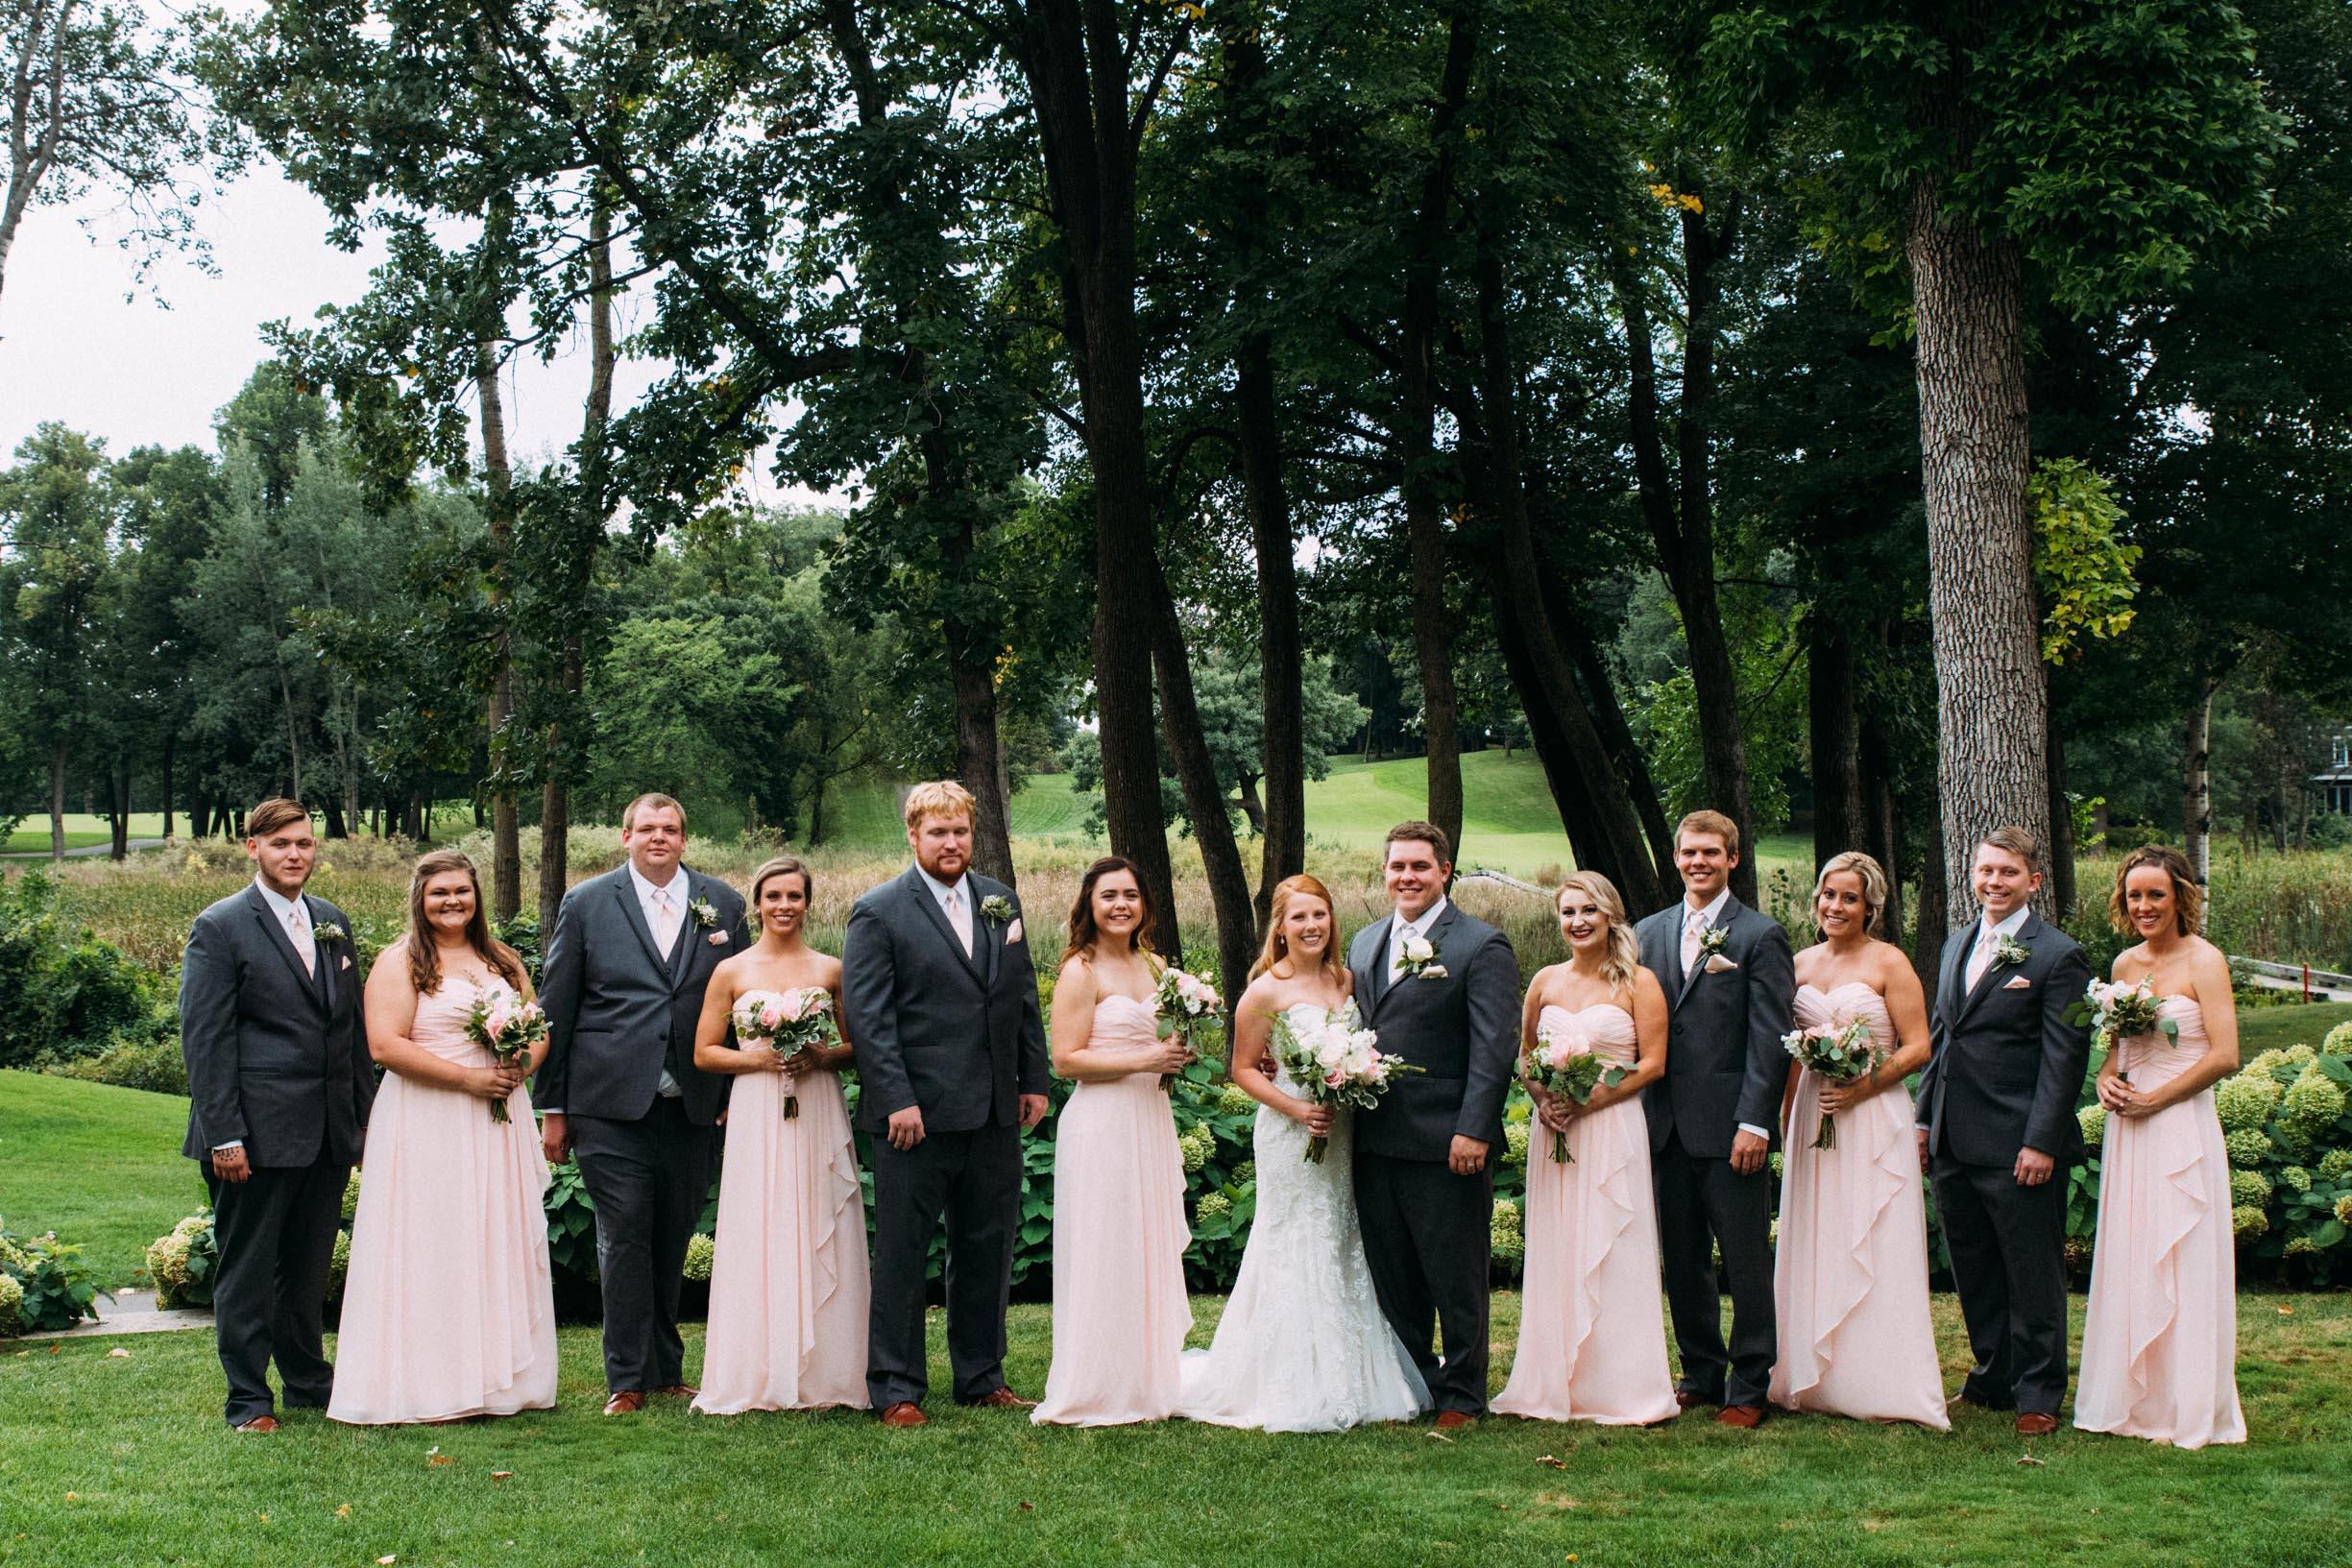 Megan_Zach_Minneapolis_Bearpath_Wedding_Blog-23.jpg